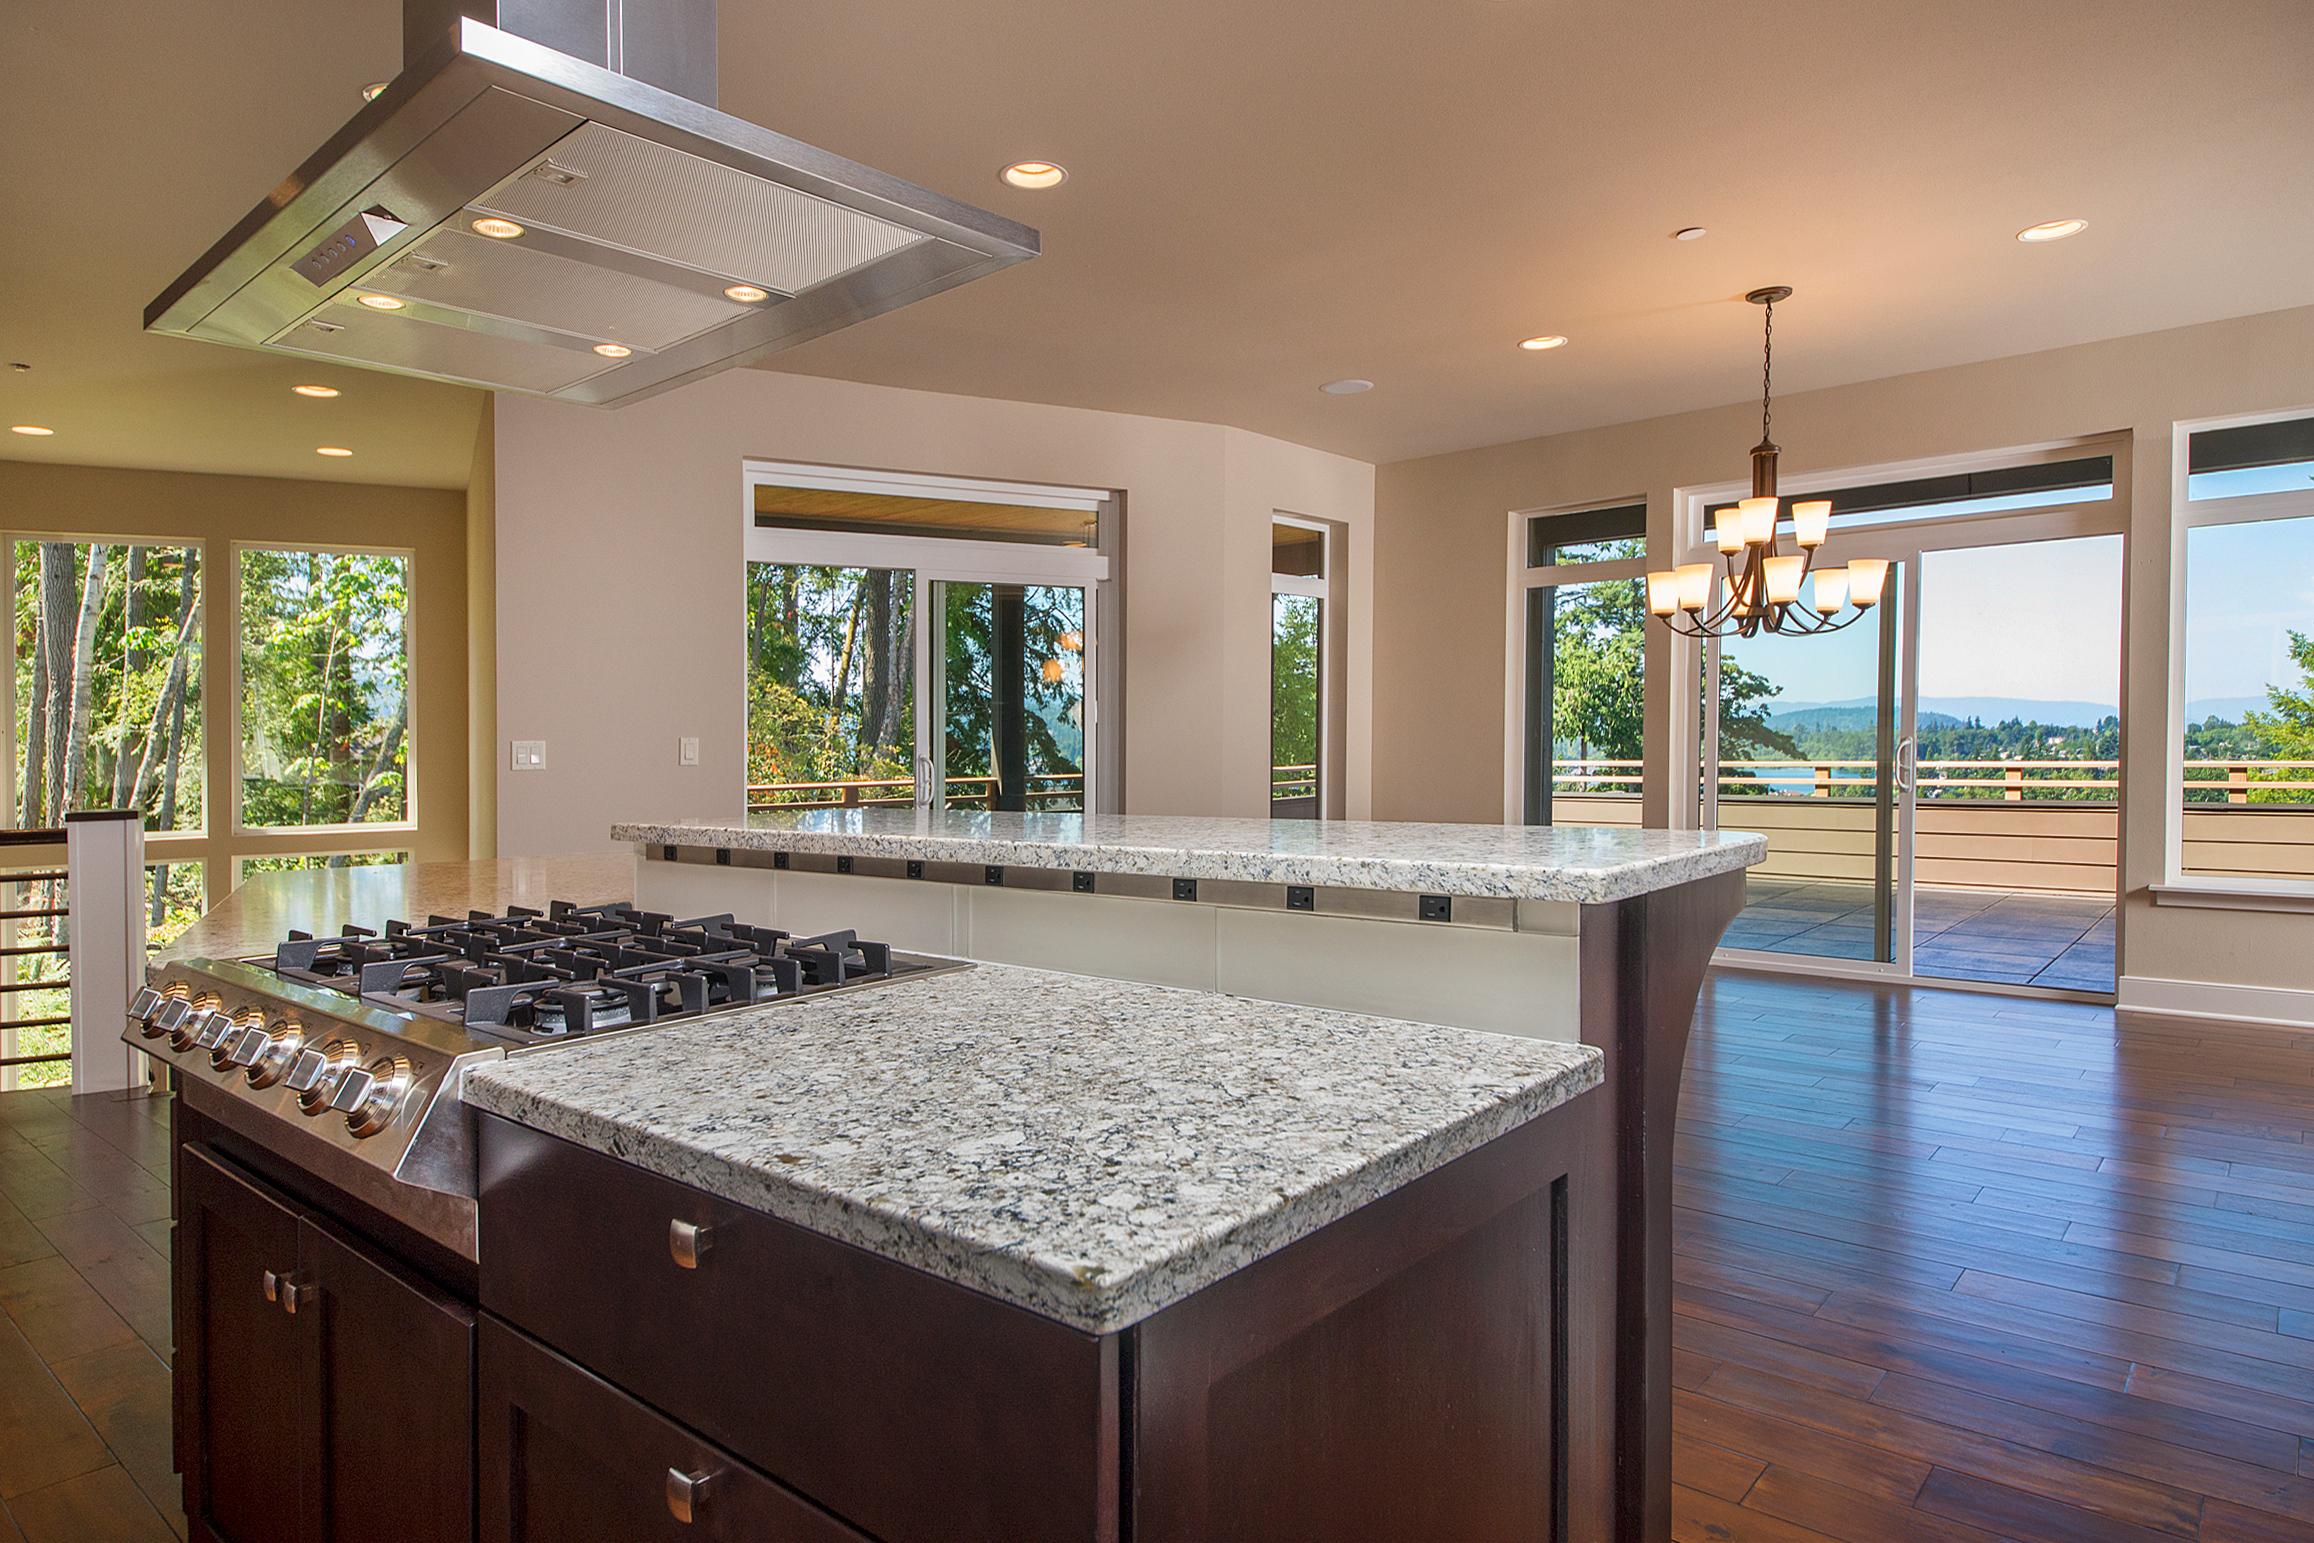 kitchen+1-3418586924-O.jpg